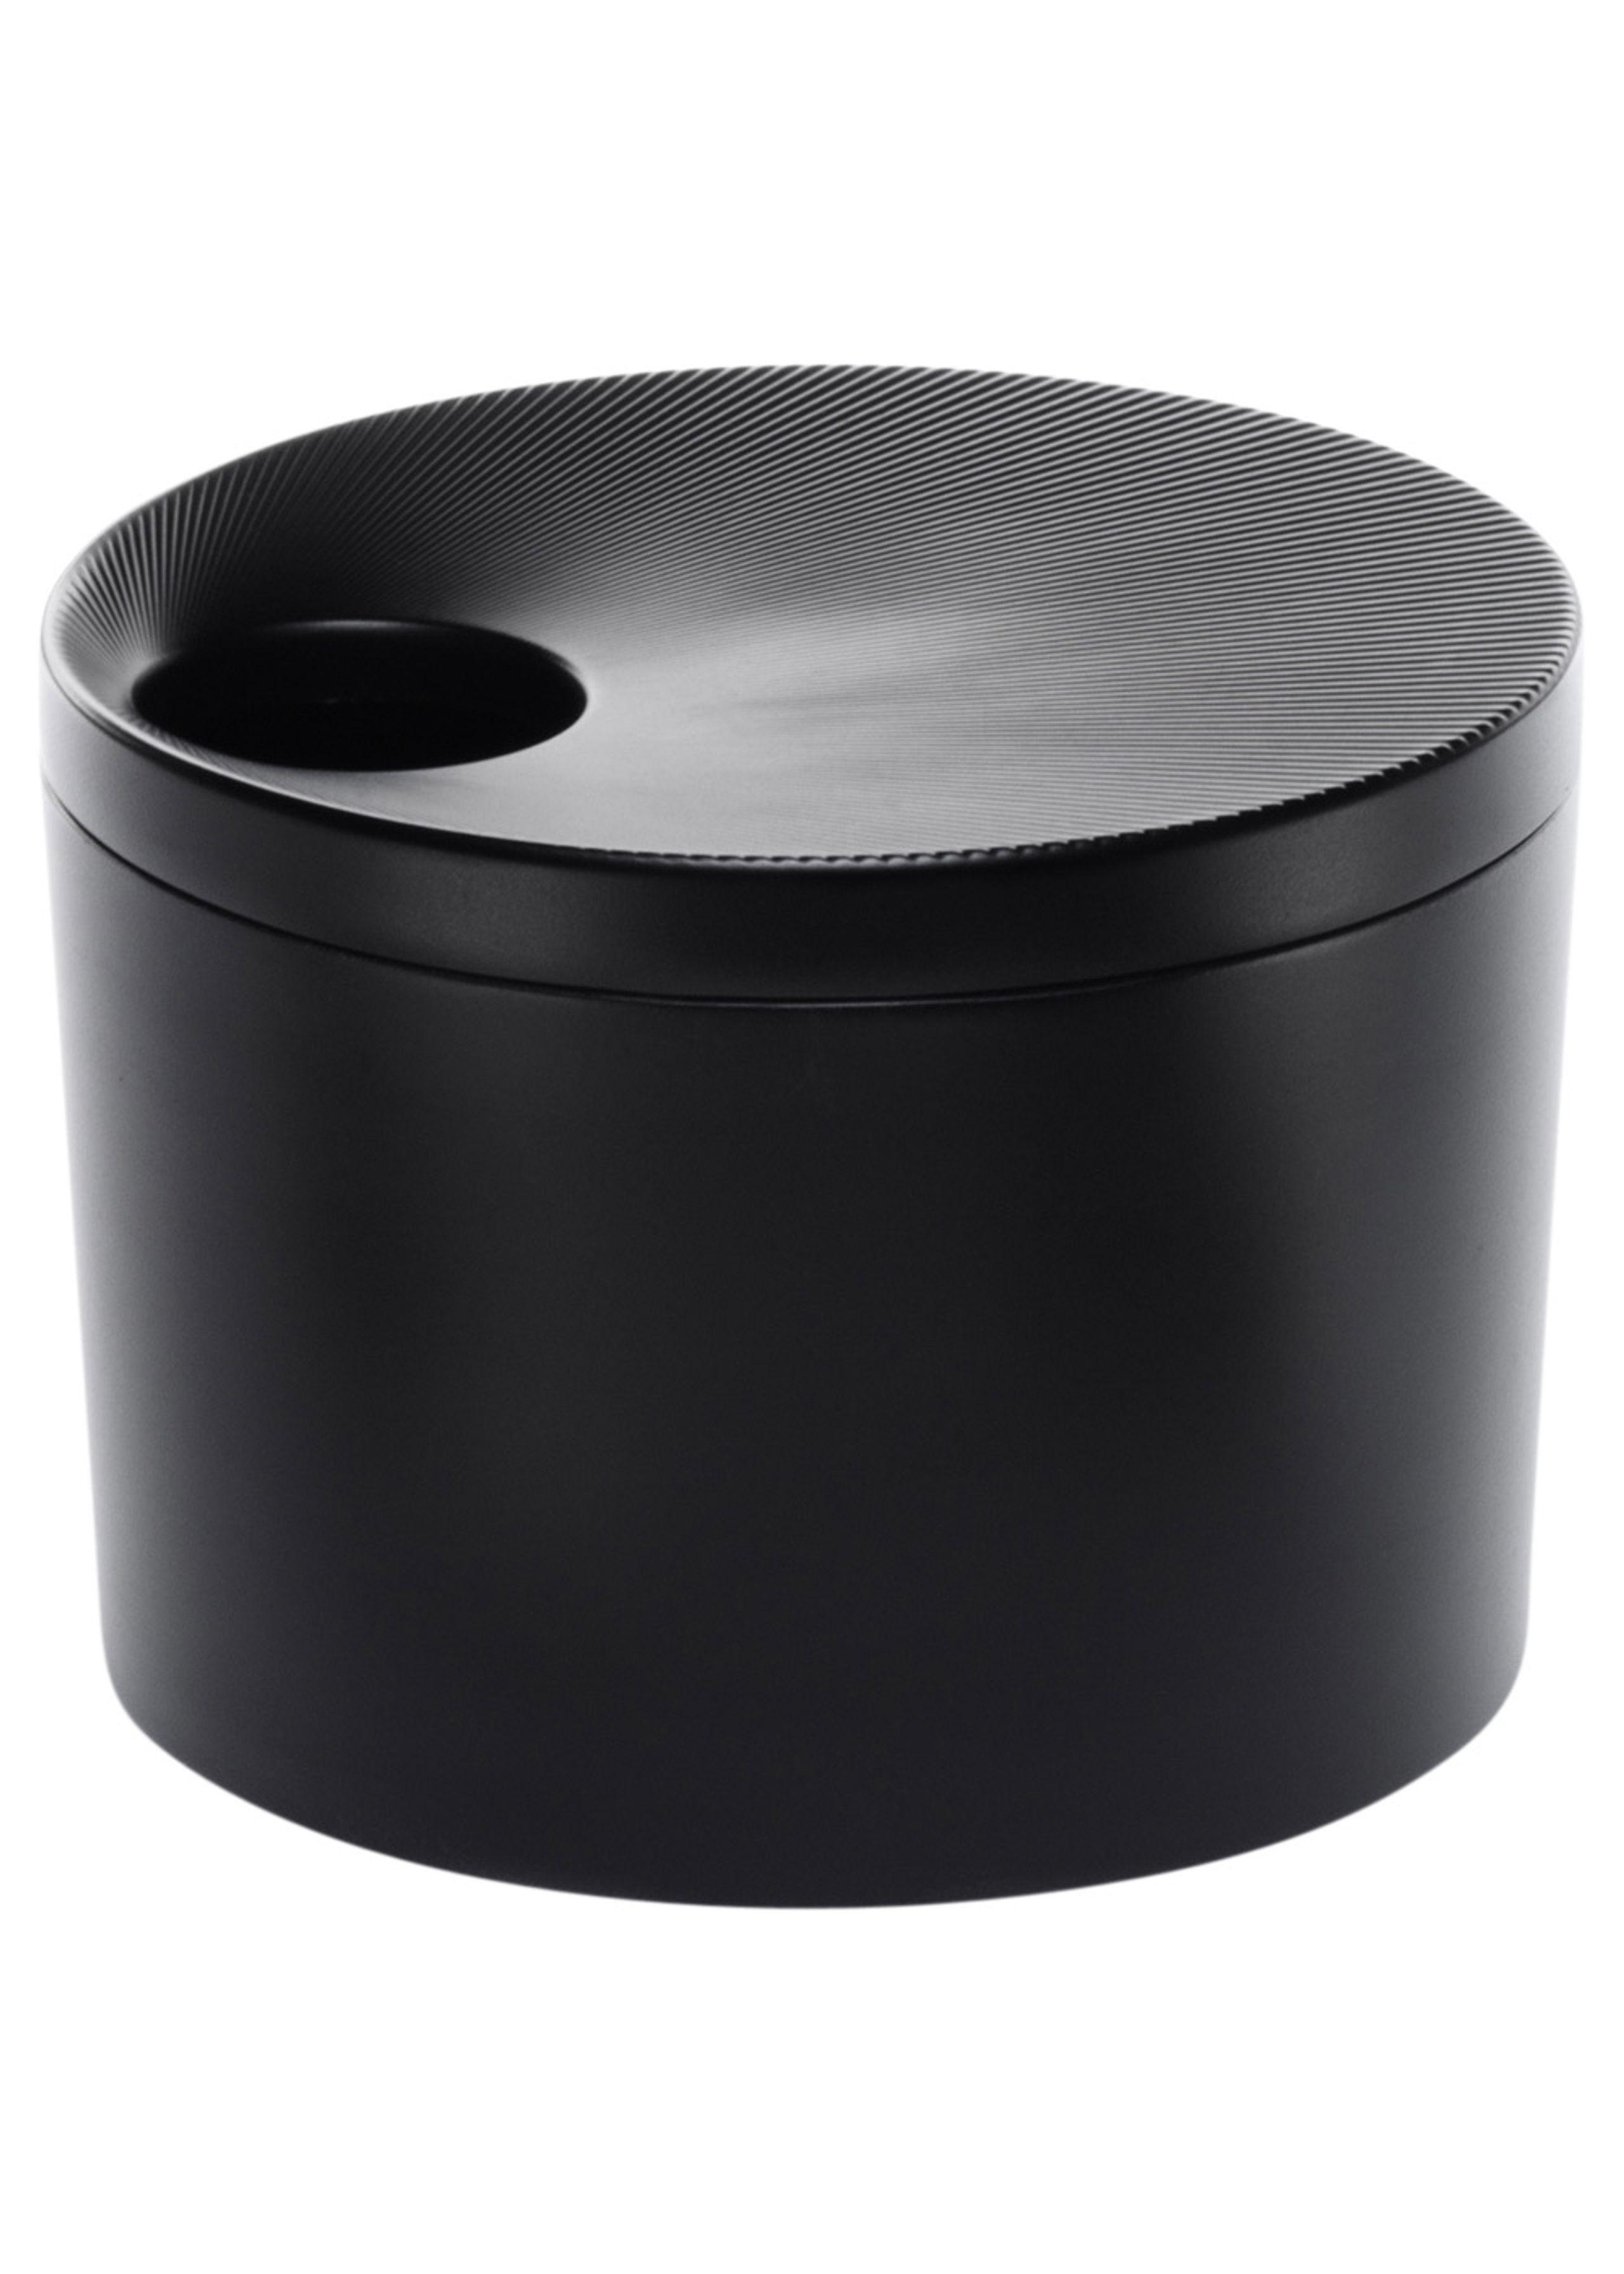 Stepp two ashtray